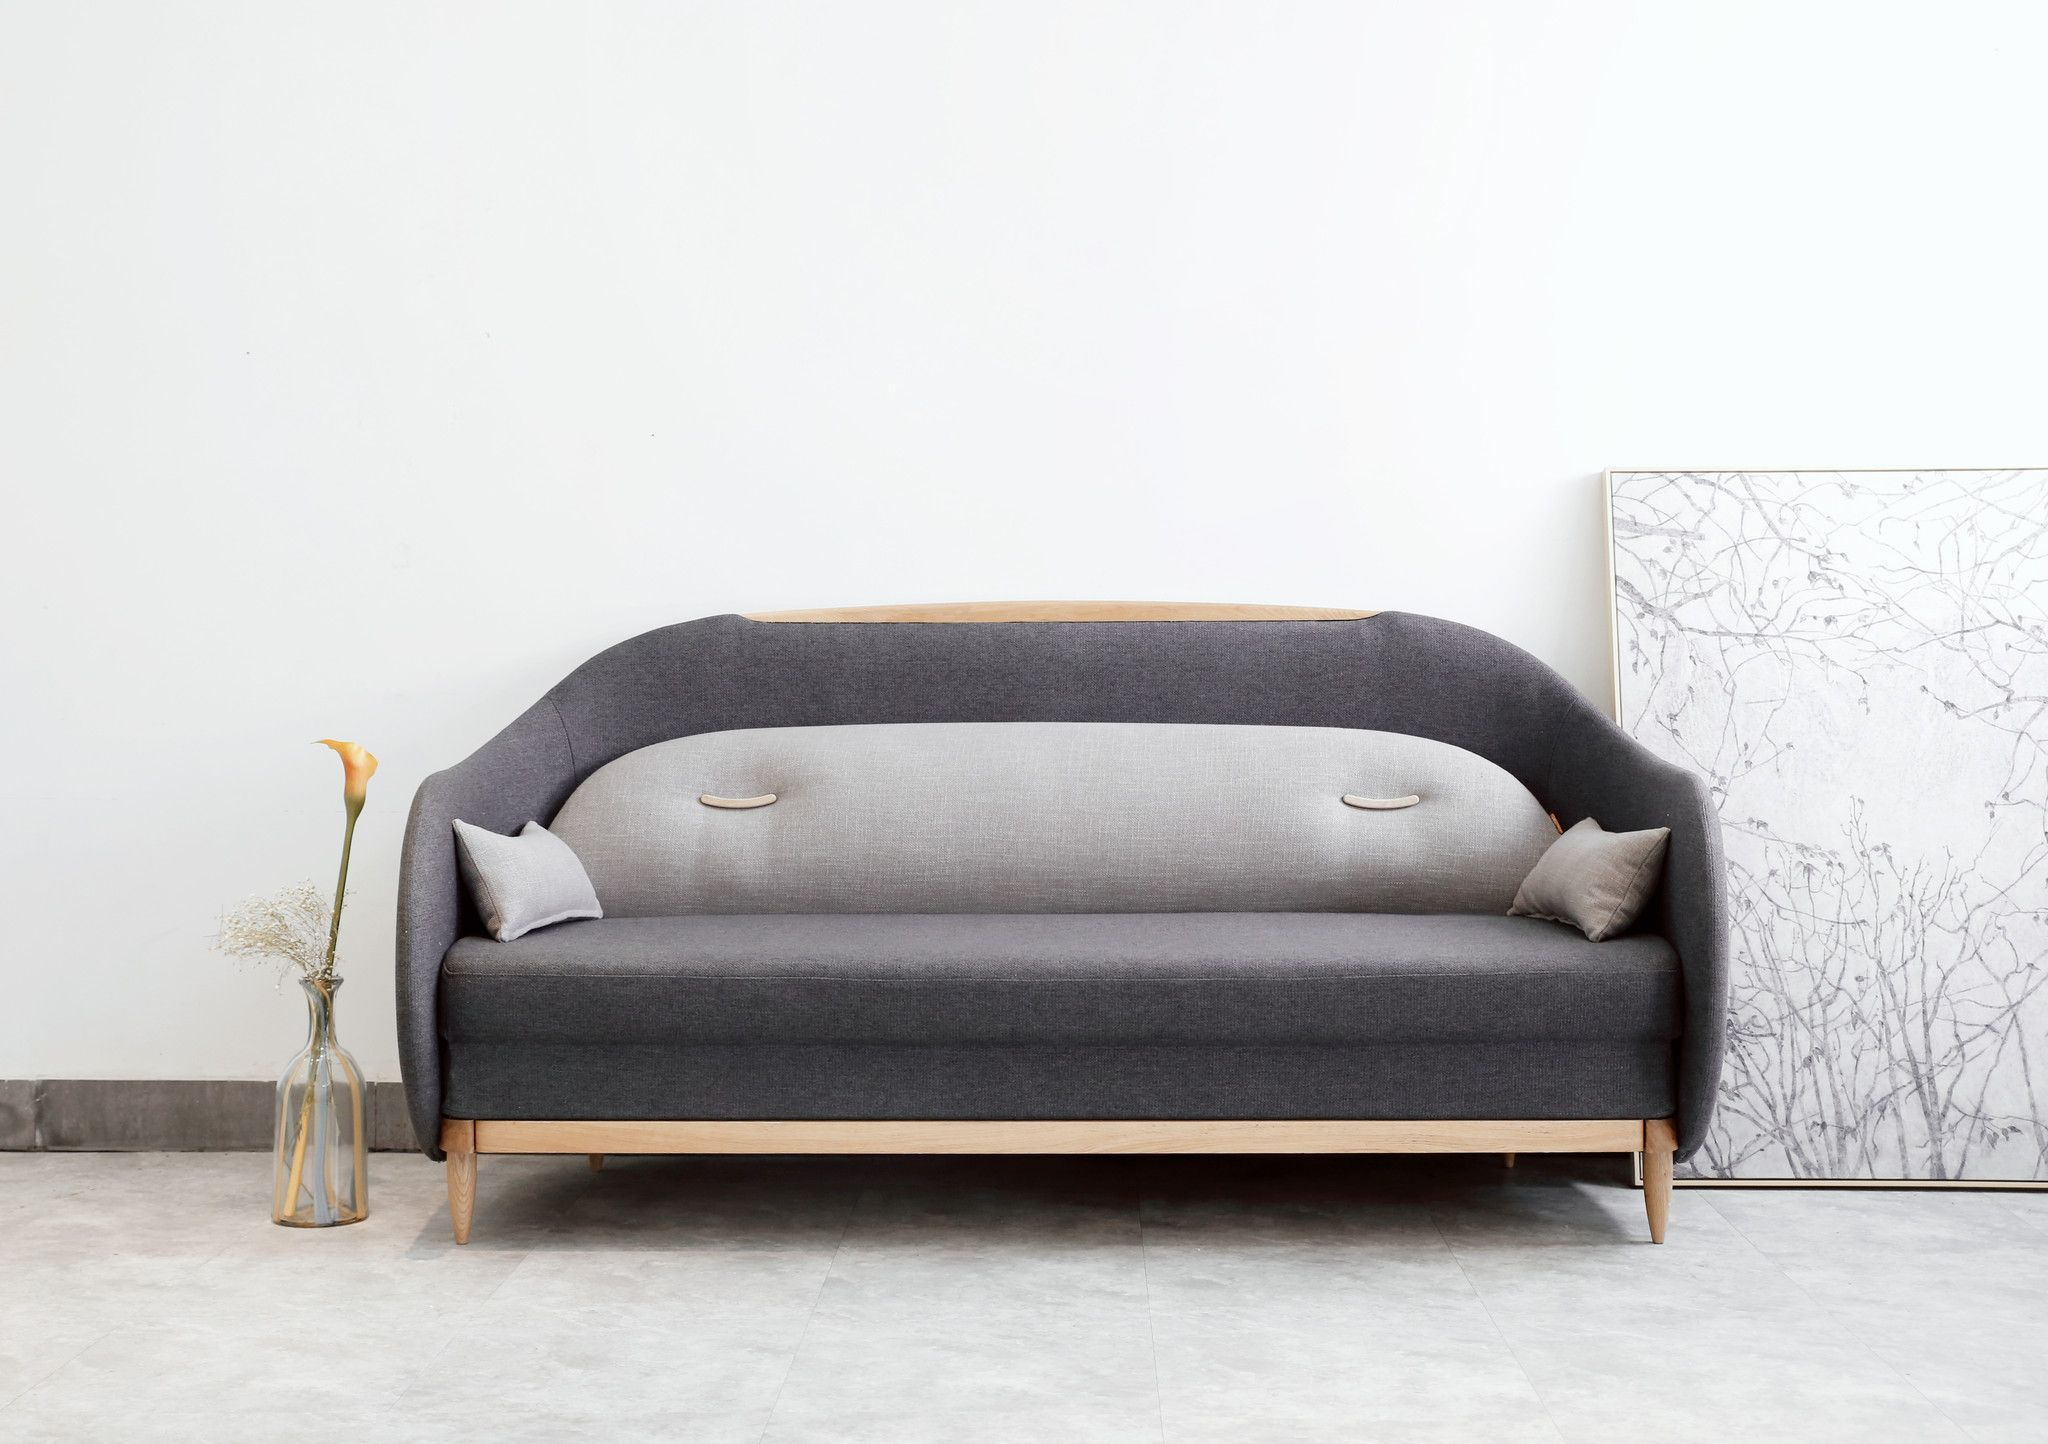 Excellent Recess Sofa Bed Furniture Modern Home Furniture Sofa Download Free Architecture Designs Sospemadebymaigaardcom